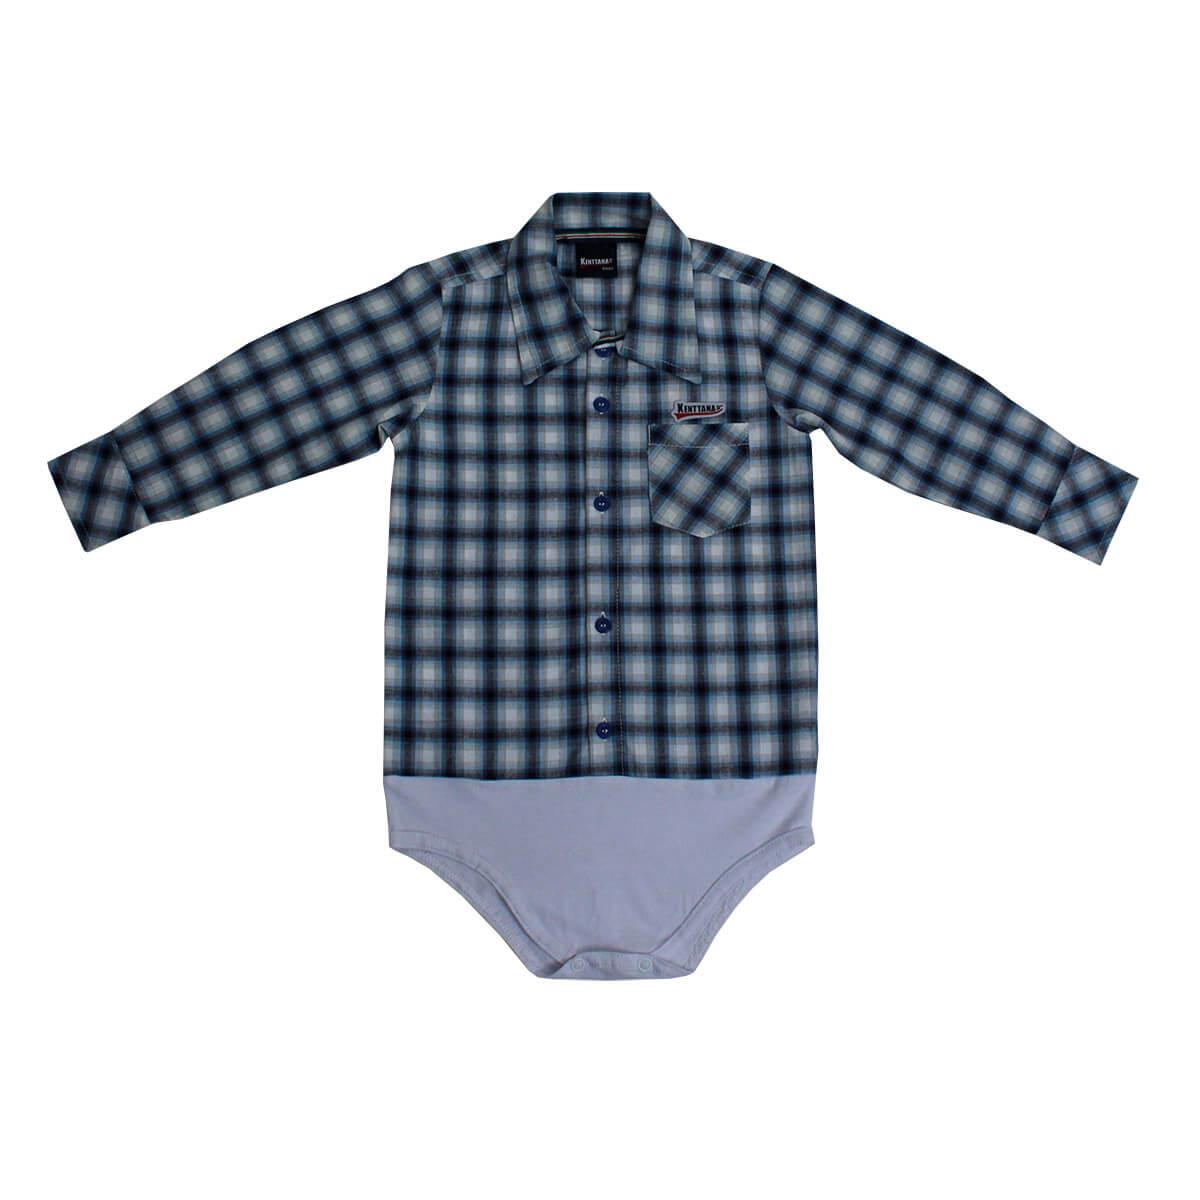 Body De Bebê Kenttana Masculino Longa Xadrez Azul E Preto